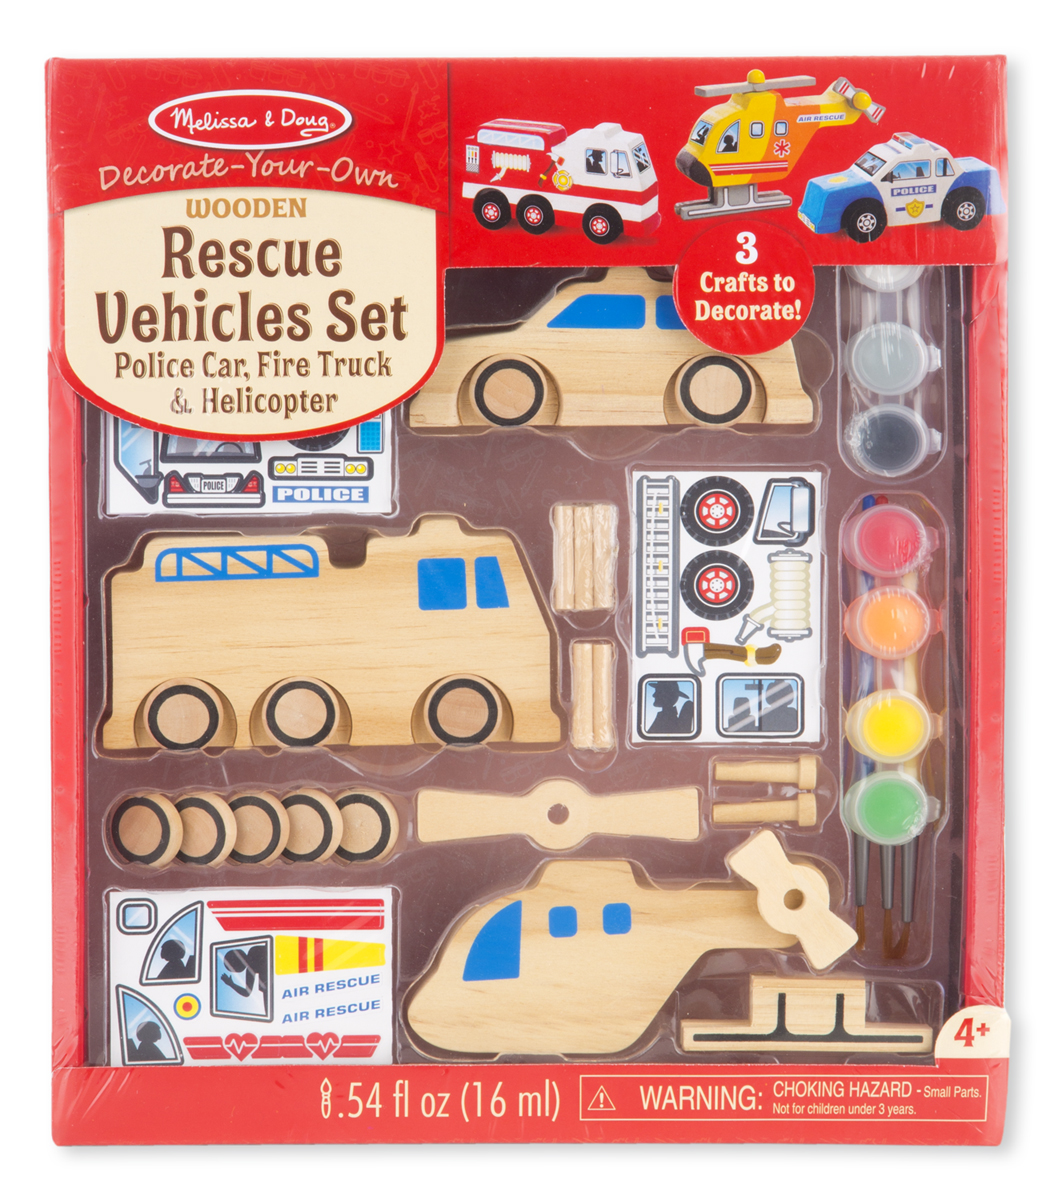 Rescue Vehicles Set Cars